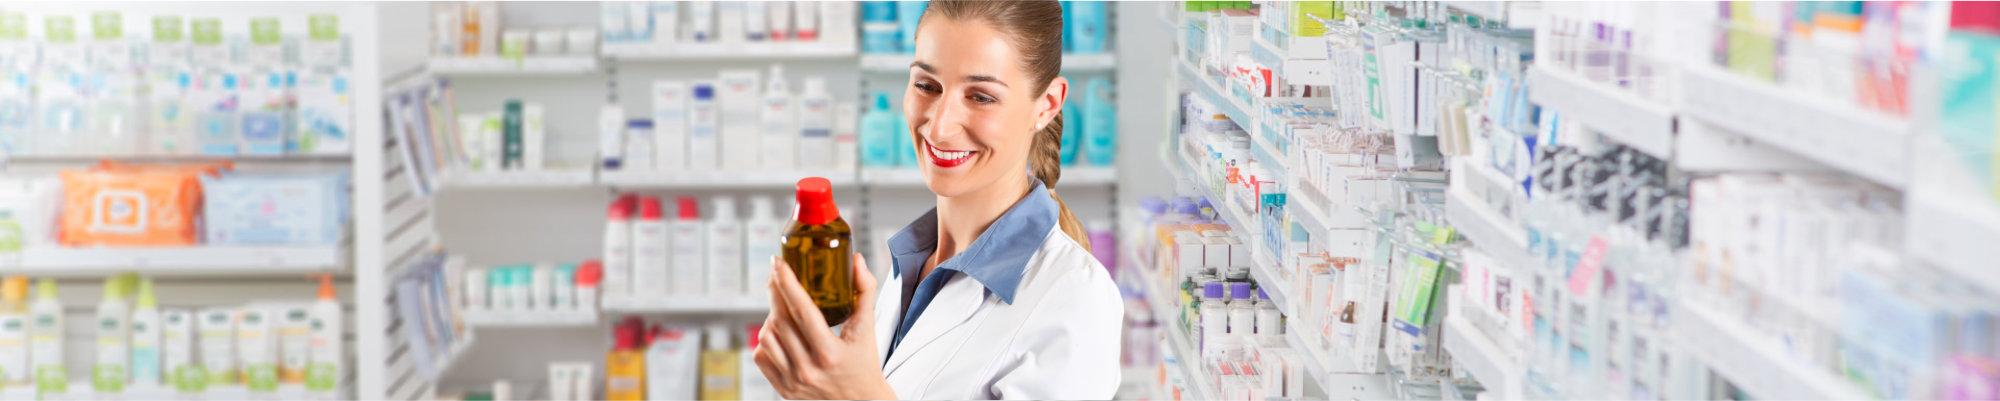 Portrait of a Female pharmacist smiling